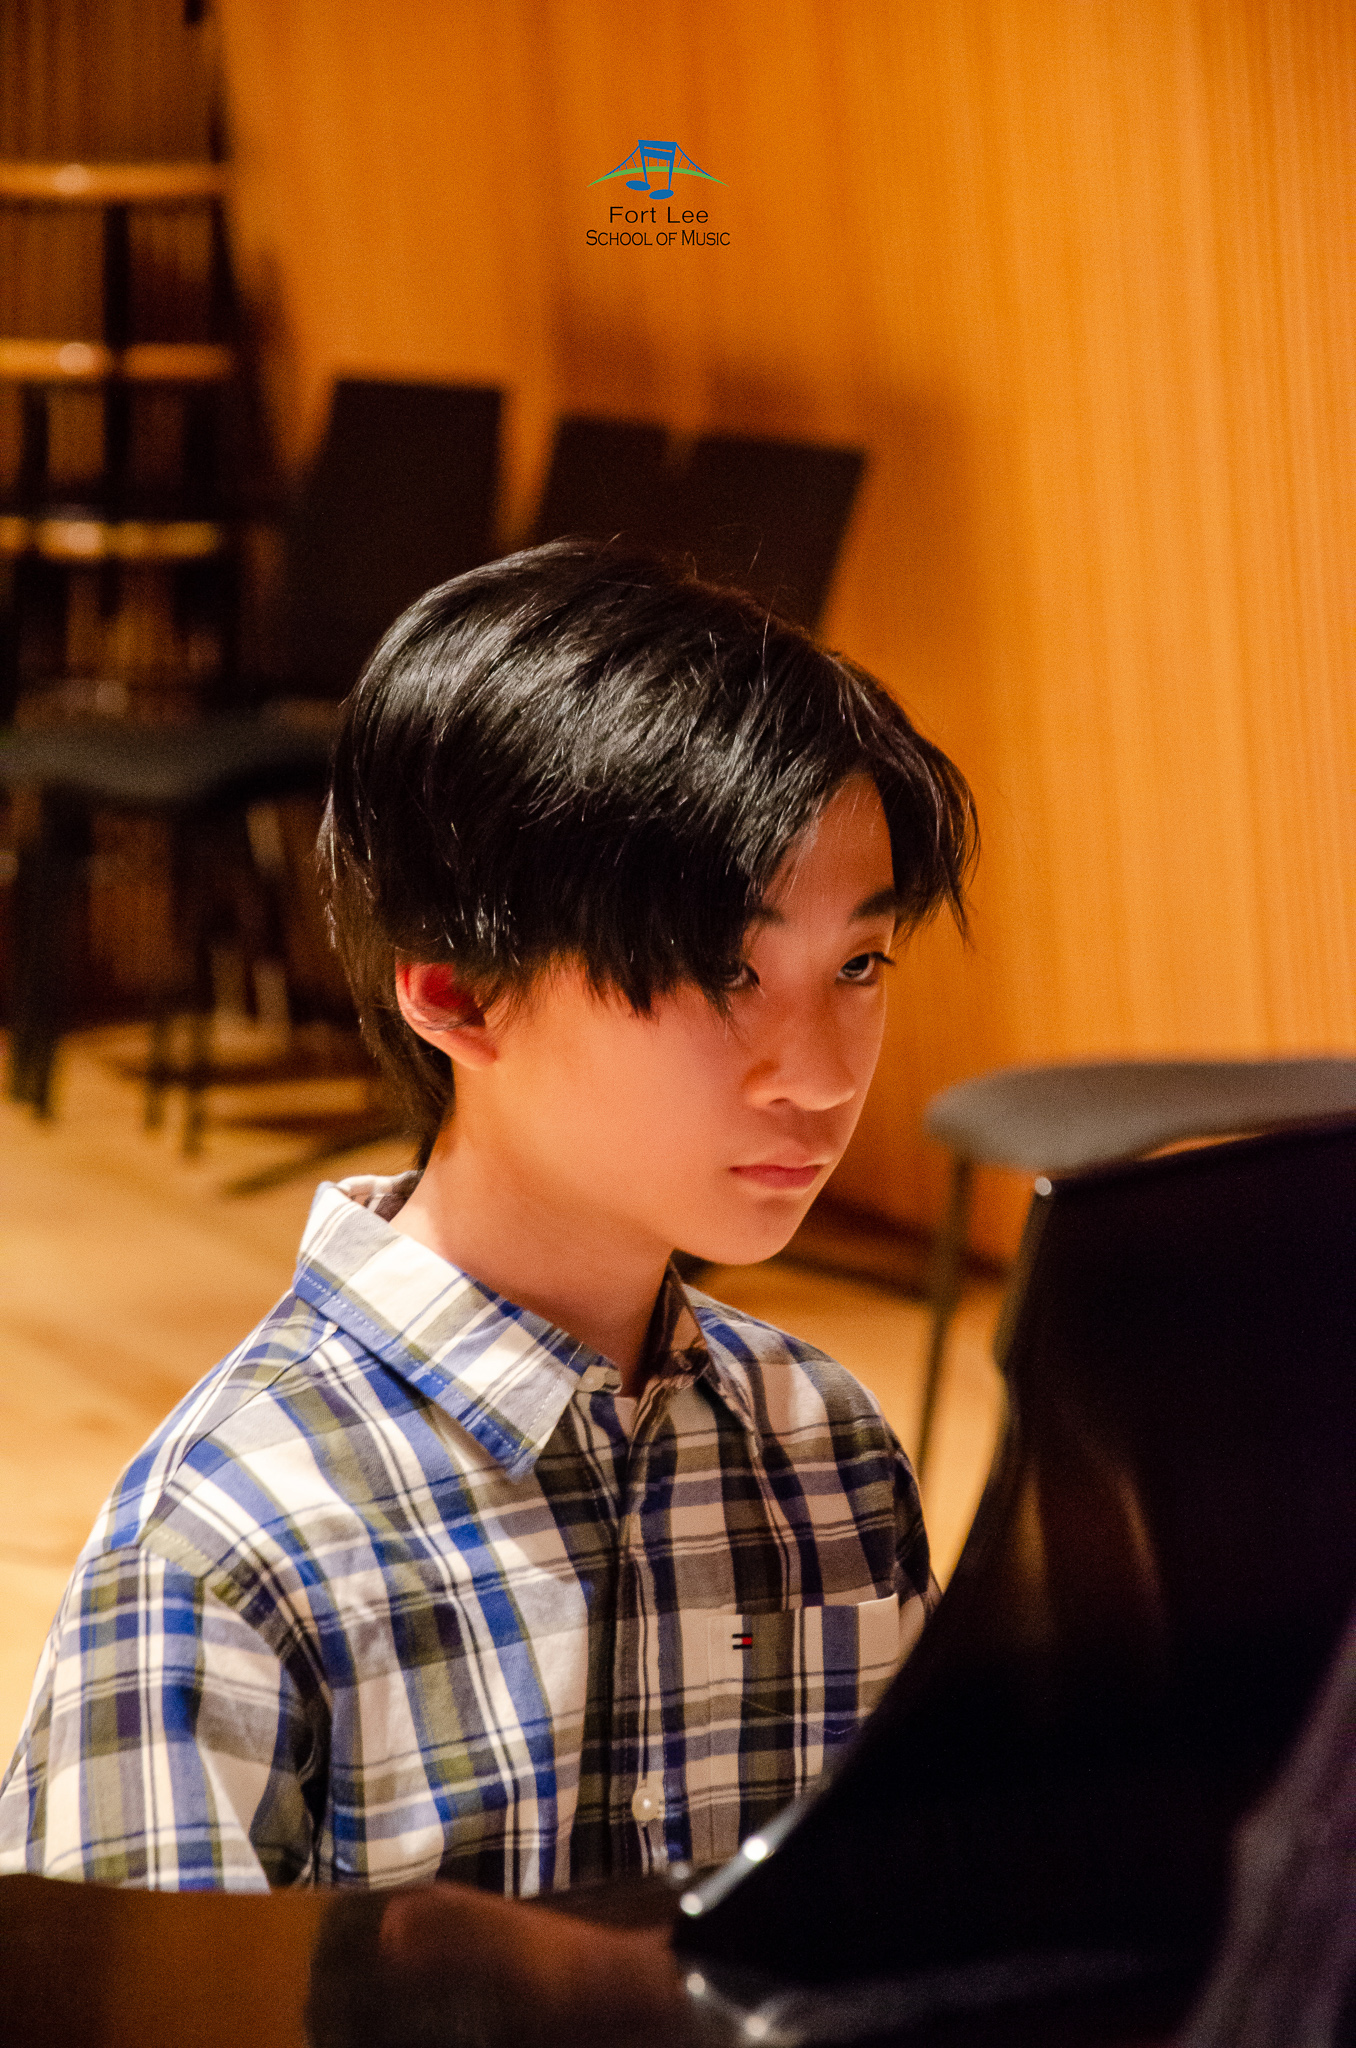 music-schools-for-kids.jpg